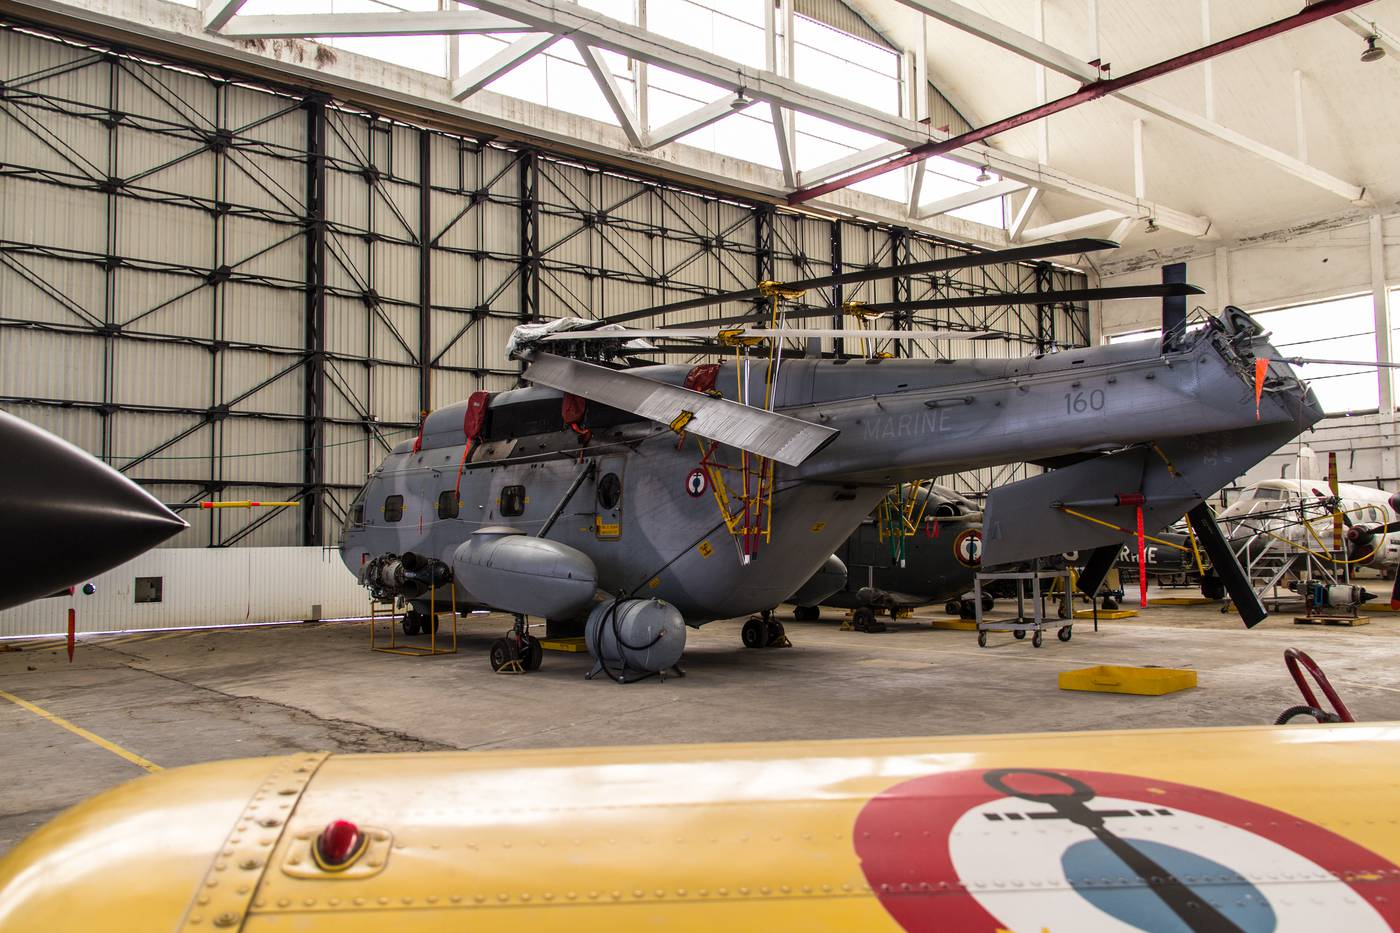 Naam: rochefort-ocean-rochefort-musee-aeronautique-navale2.jpg Bekeken: 262 Grootte: 193,1 KB